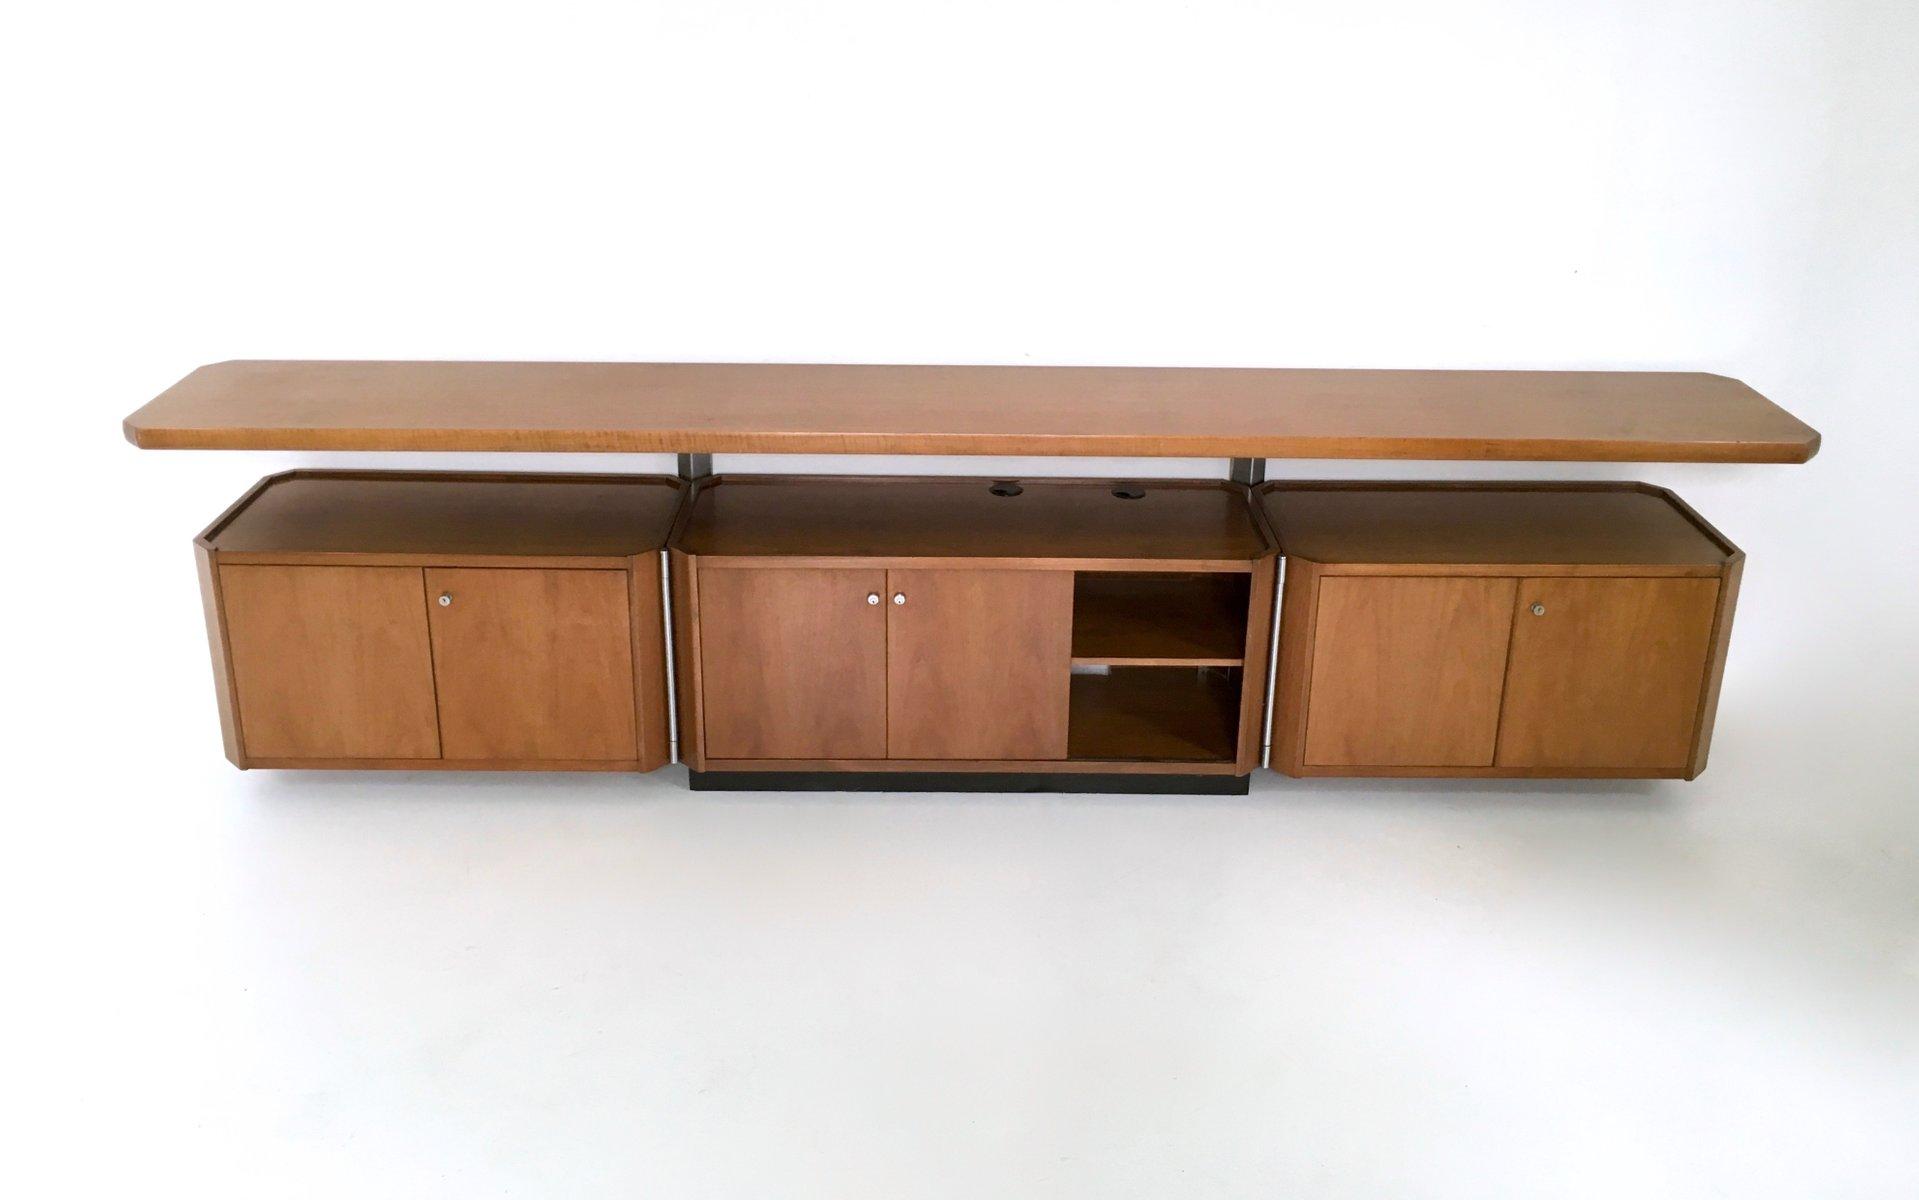 Vintage Sideboard von Osvaldo Borsani für Tecno